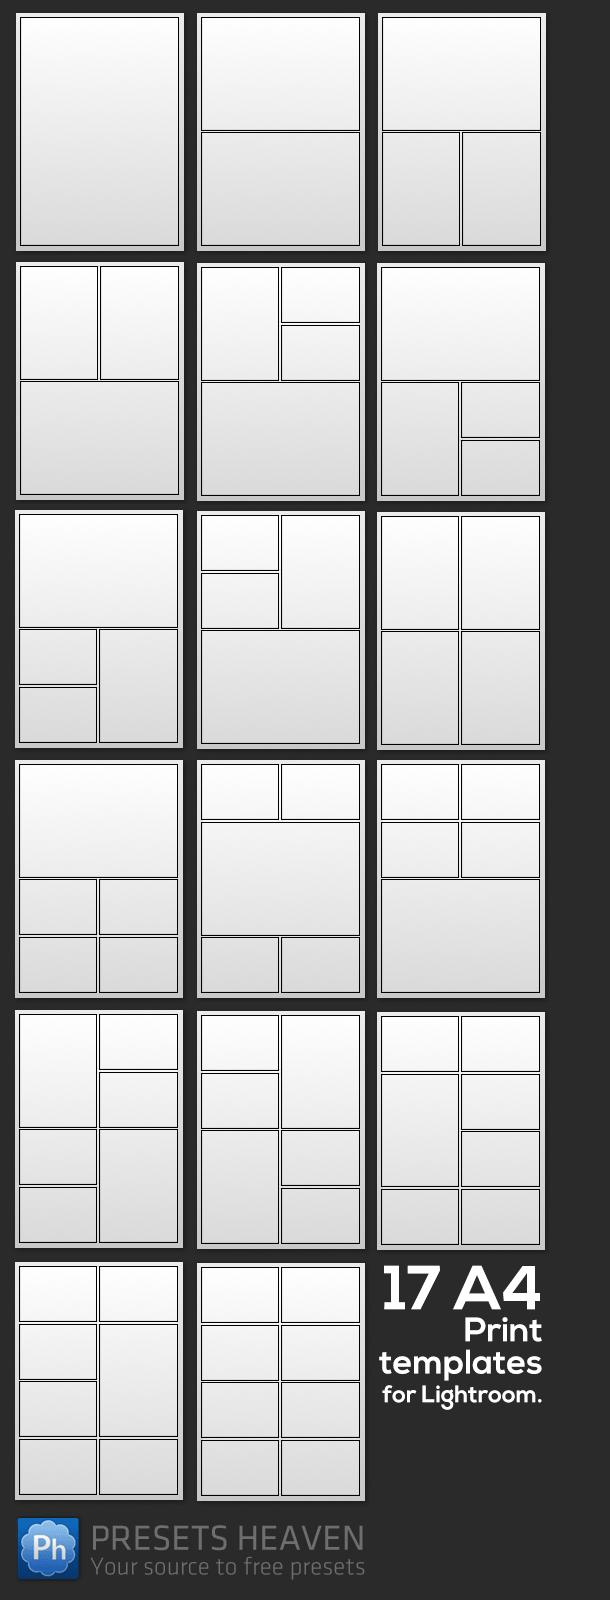 Amazing image throughout free print templates